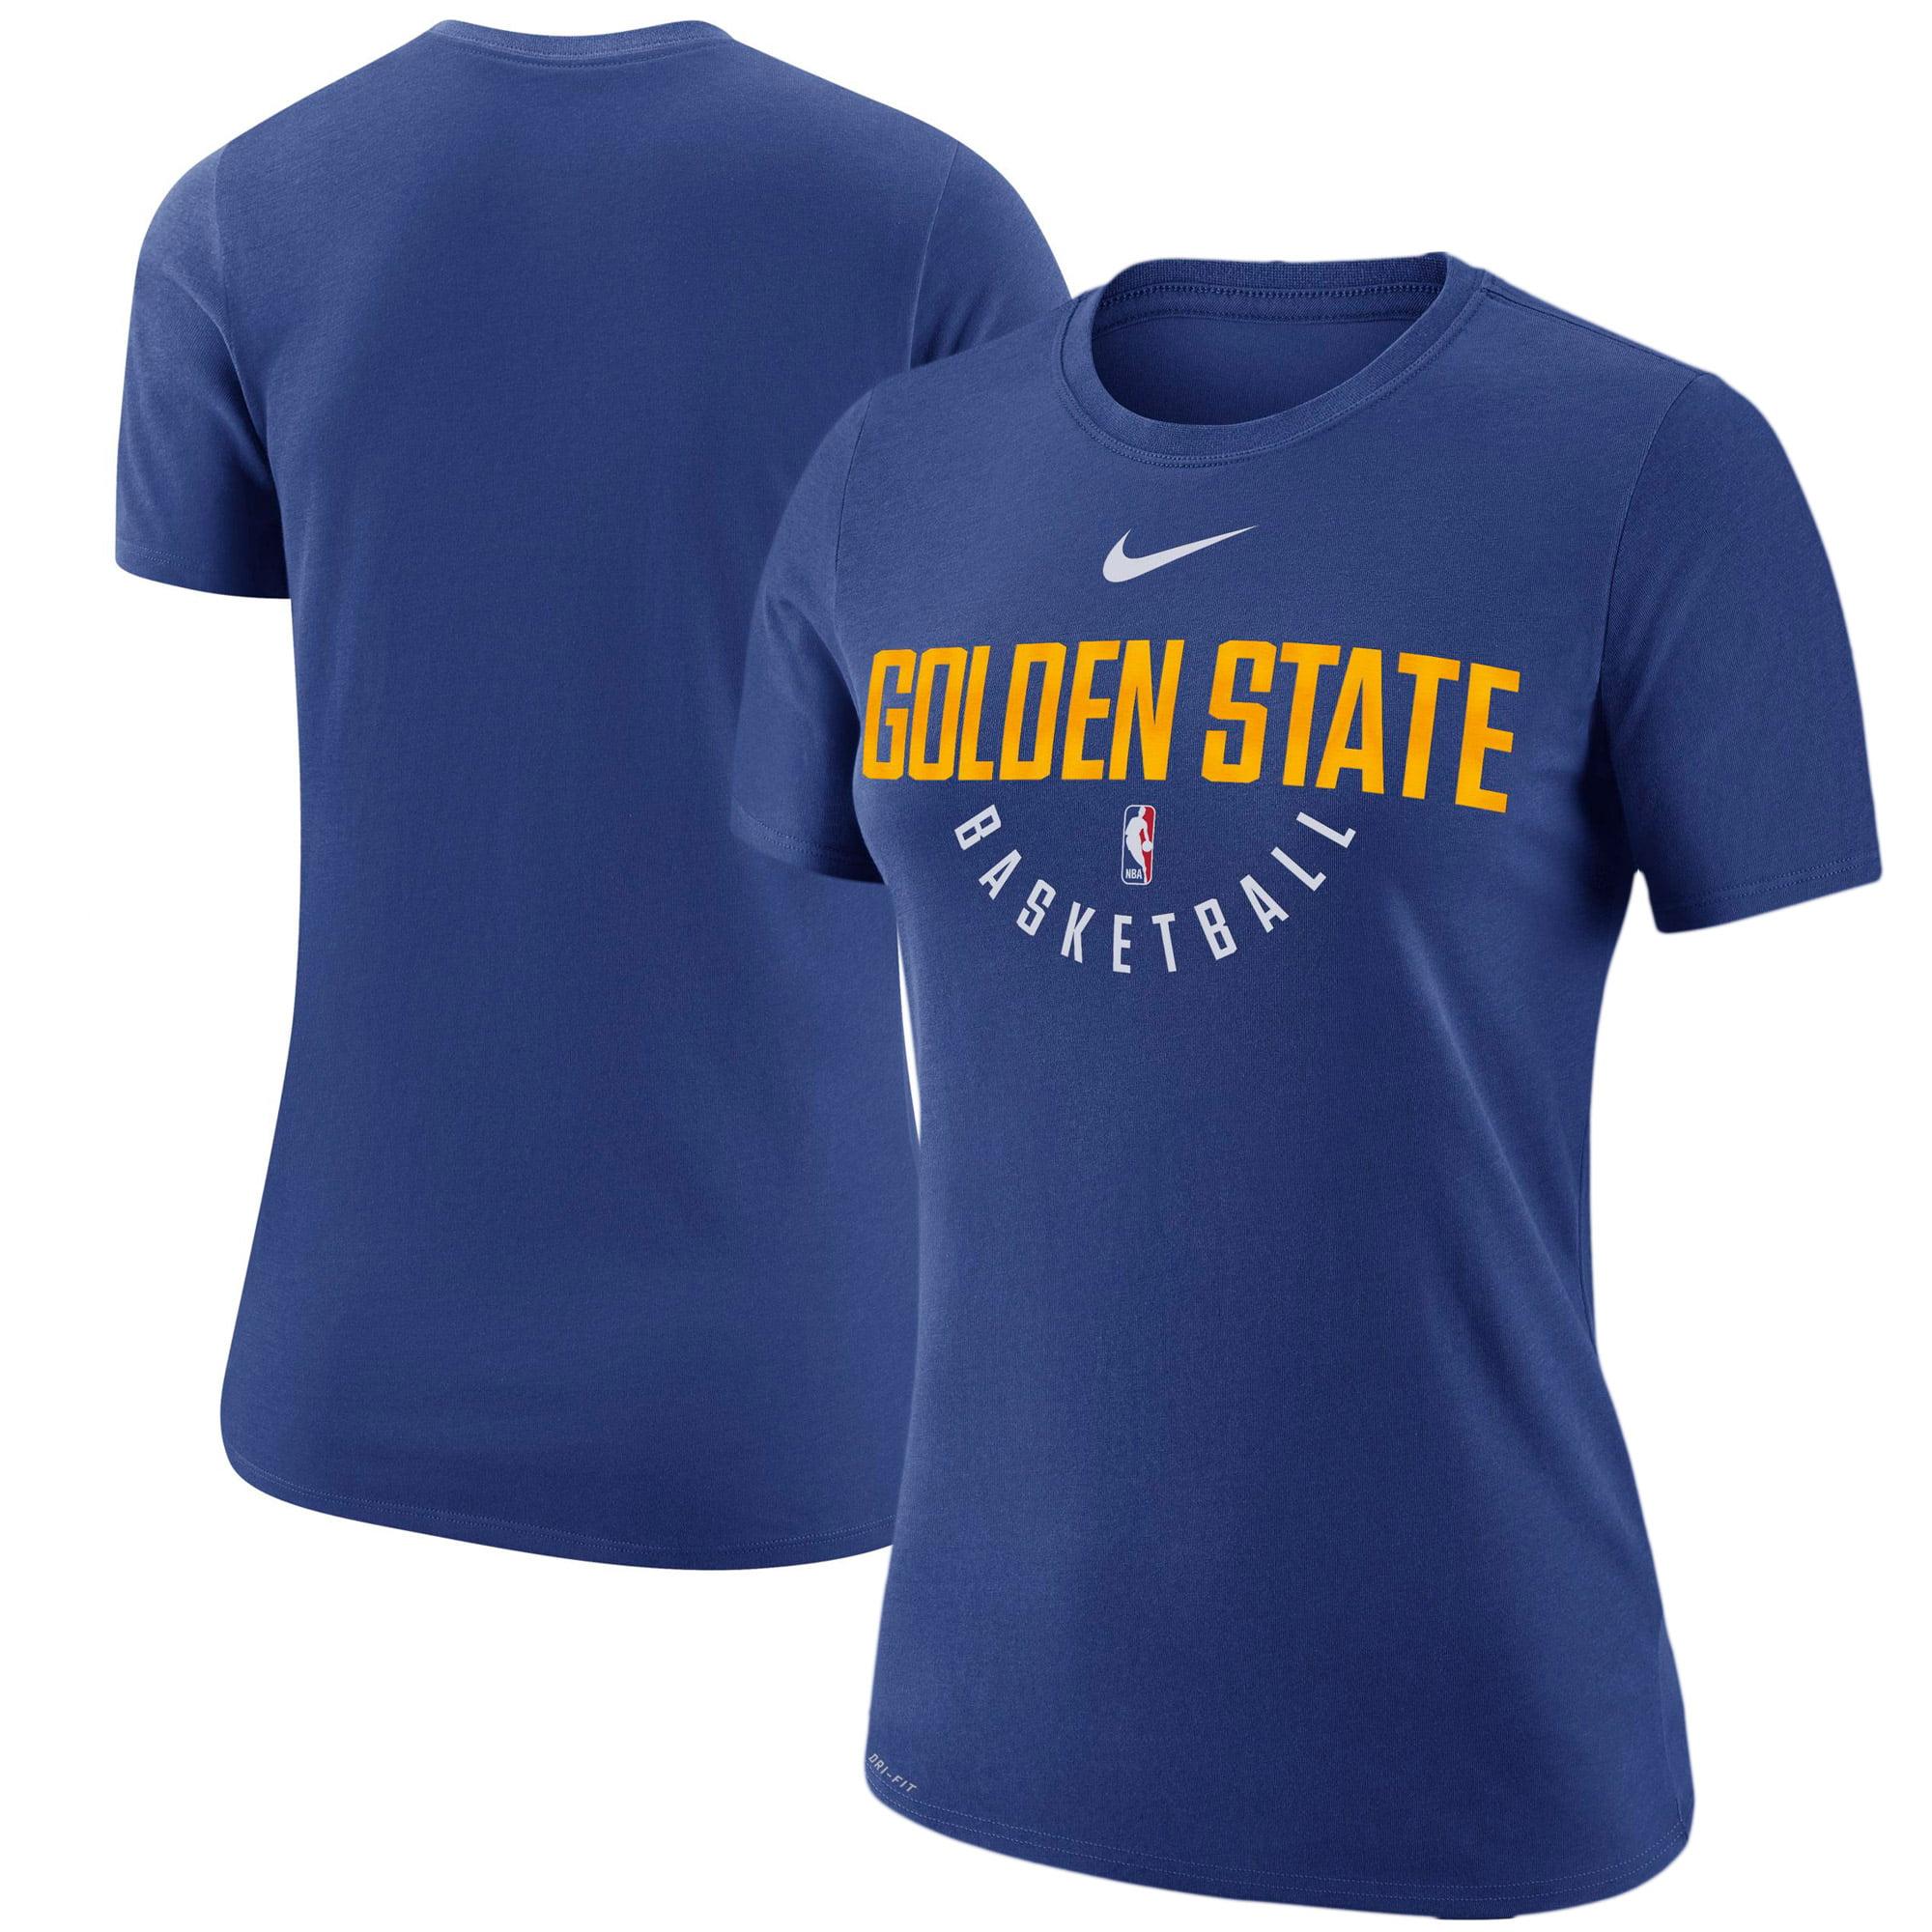 Golden State Warriors Nike Women's Practice Performance T-Shirt - Royal